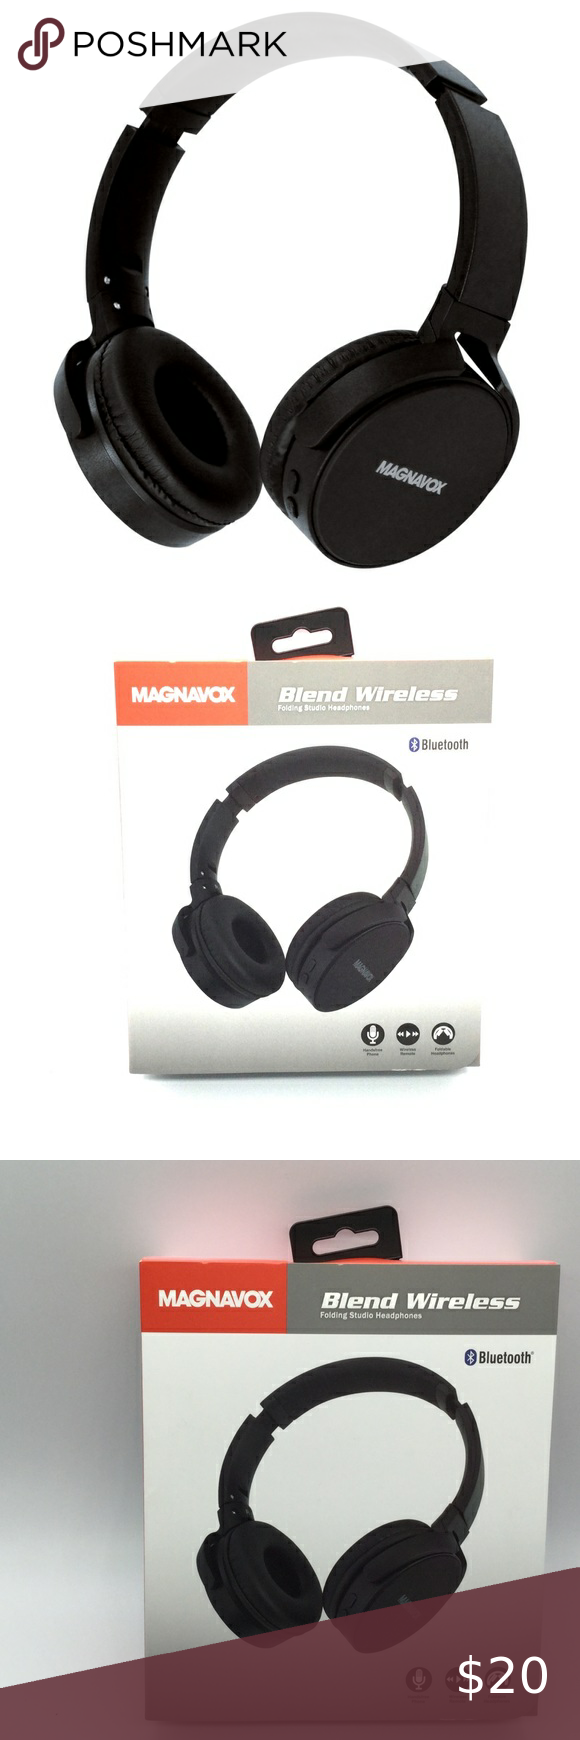 Magnavox Blend Wireless Bluetooth Headphones New Bluetooth Headphones Wireless Headphones Bluetooth Headphones